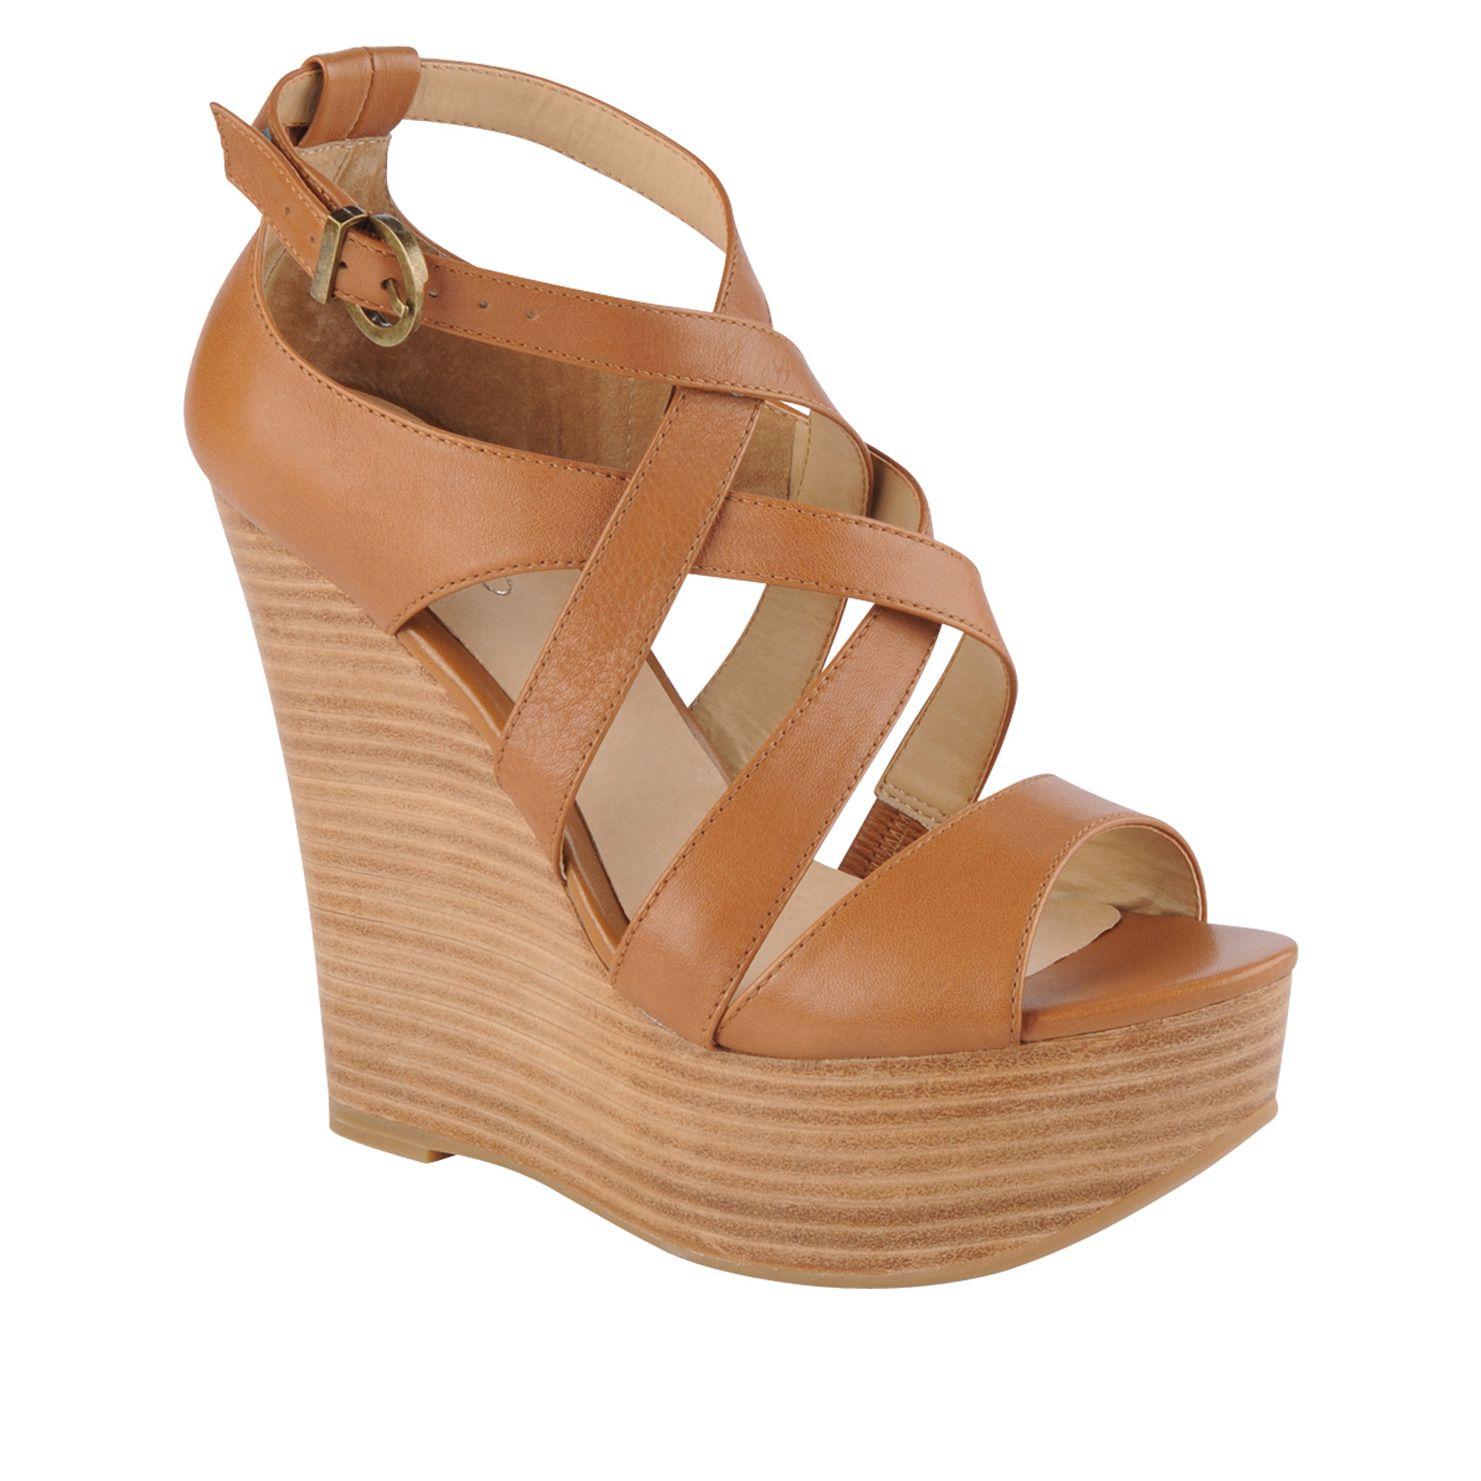 Sandals shoes sale - Larhonda Womens Wedges Sandals For Sale At Aldo Shoes